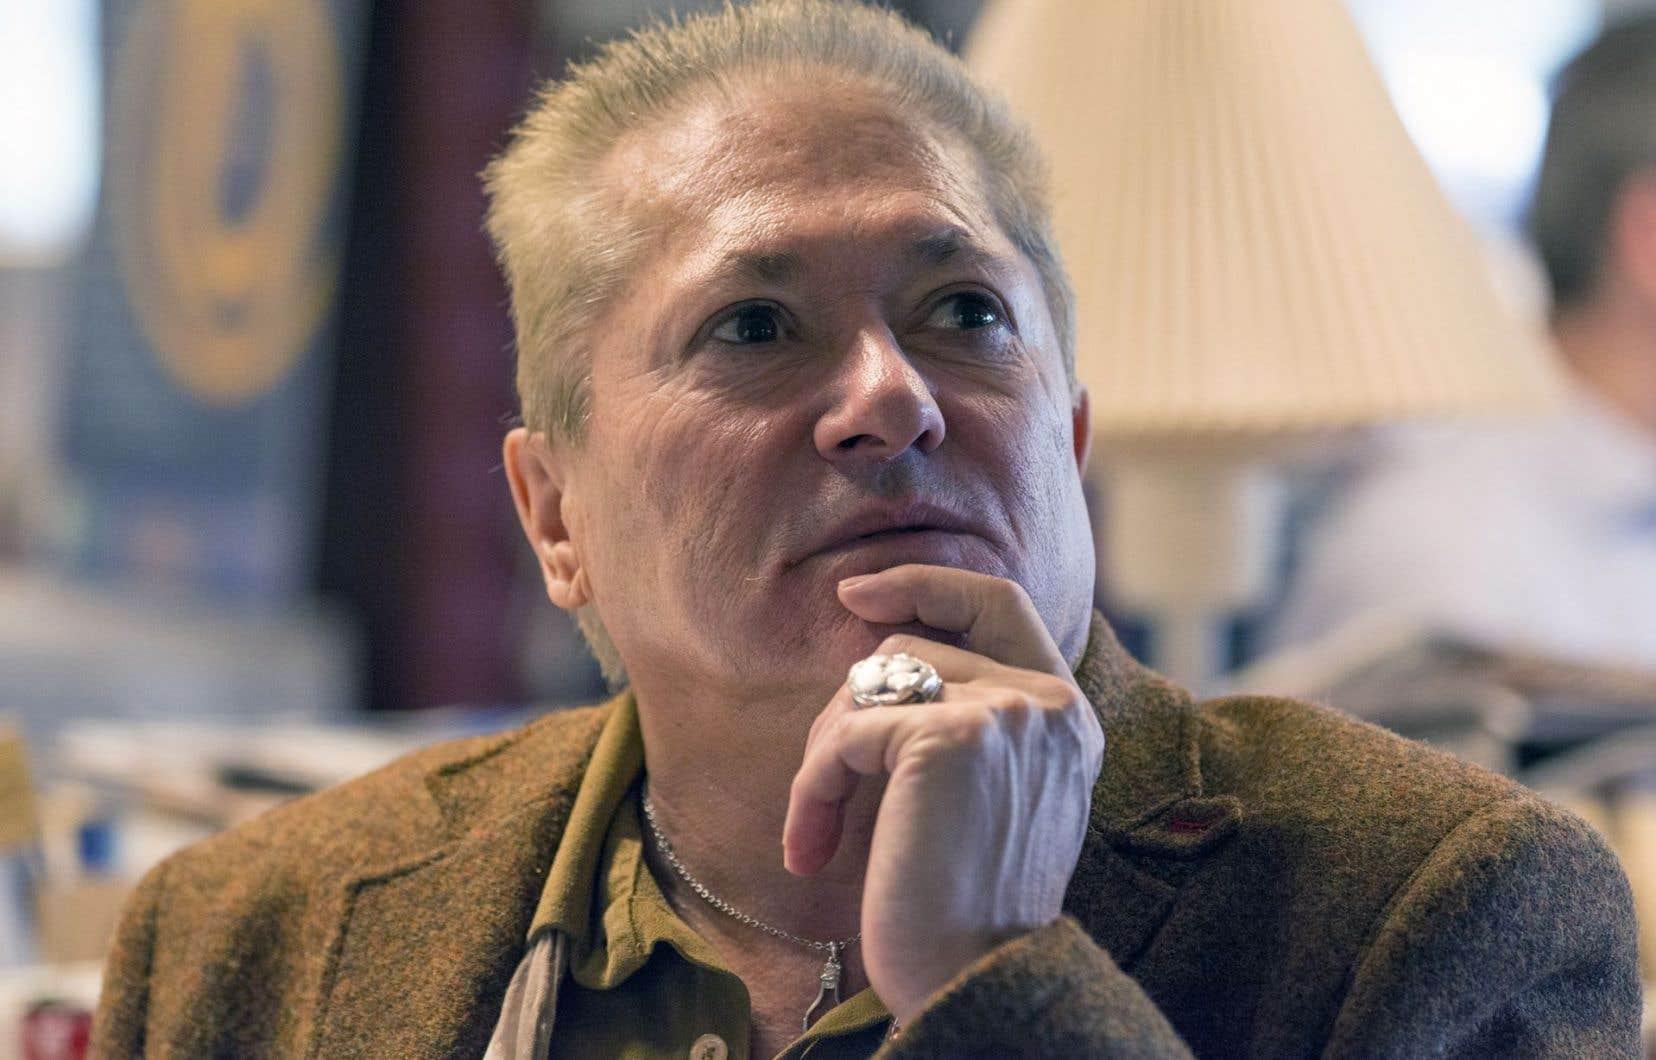 Jean-Paul Daoust